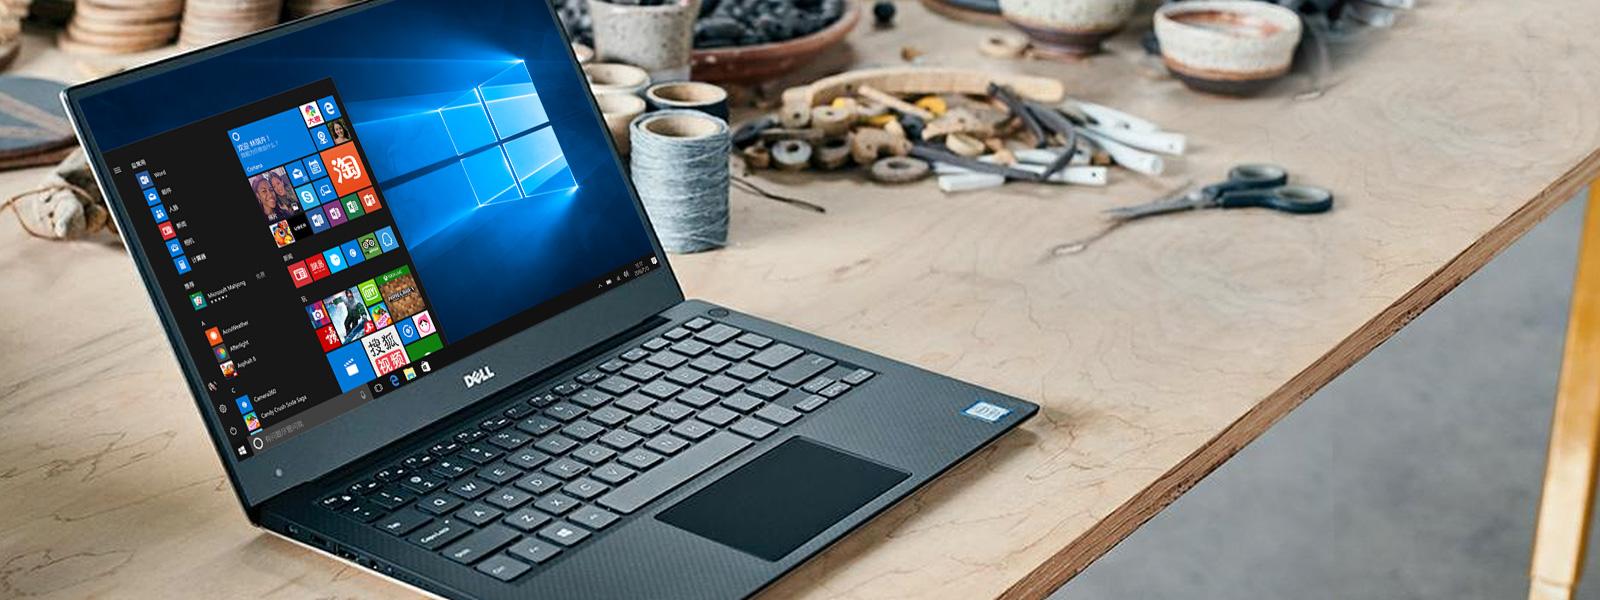 "呈现 Windows 10""开始""屏幕的 Dell XPS 13"